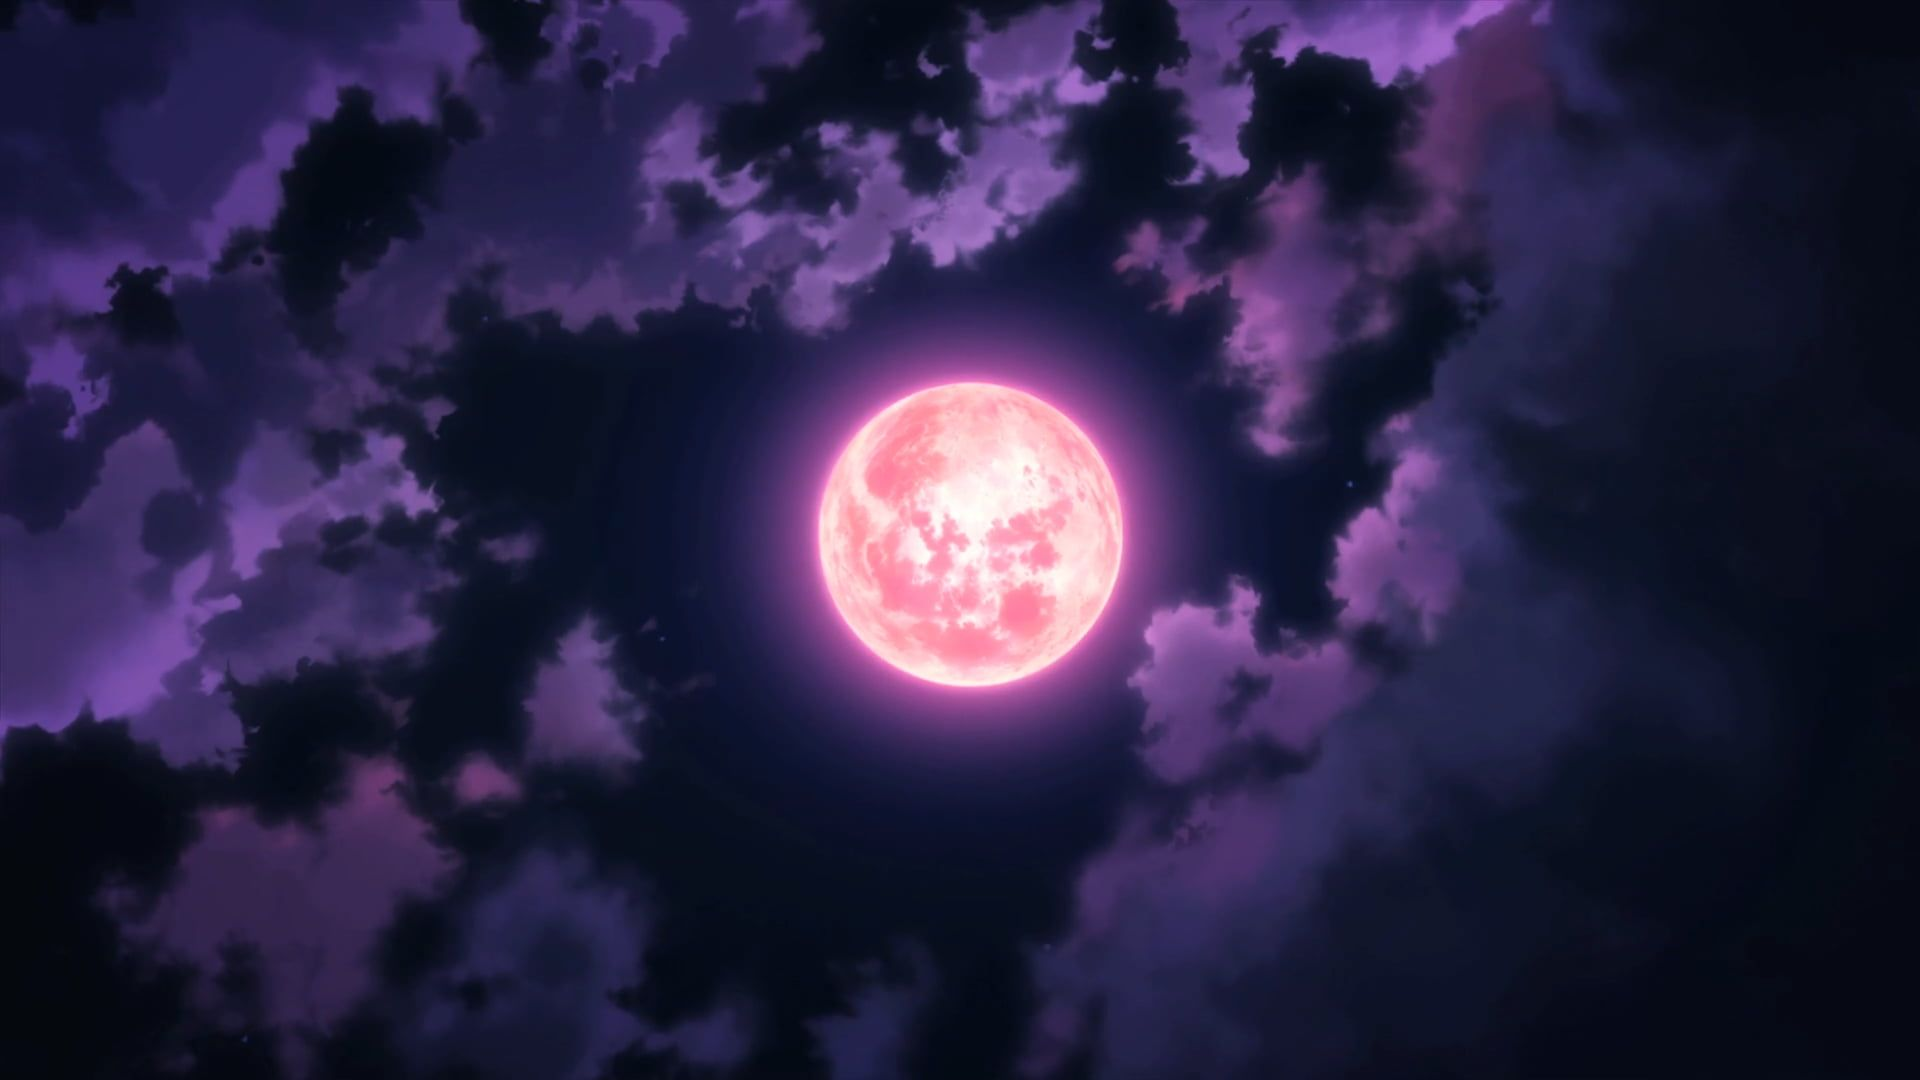 Red Moon Illustration Anime Moon Sky Clouds Night 1080p Wallpaper Hdwallpaper Desktop Sky Anime Moon Illustration Red Moon